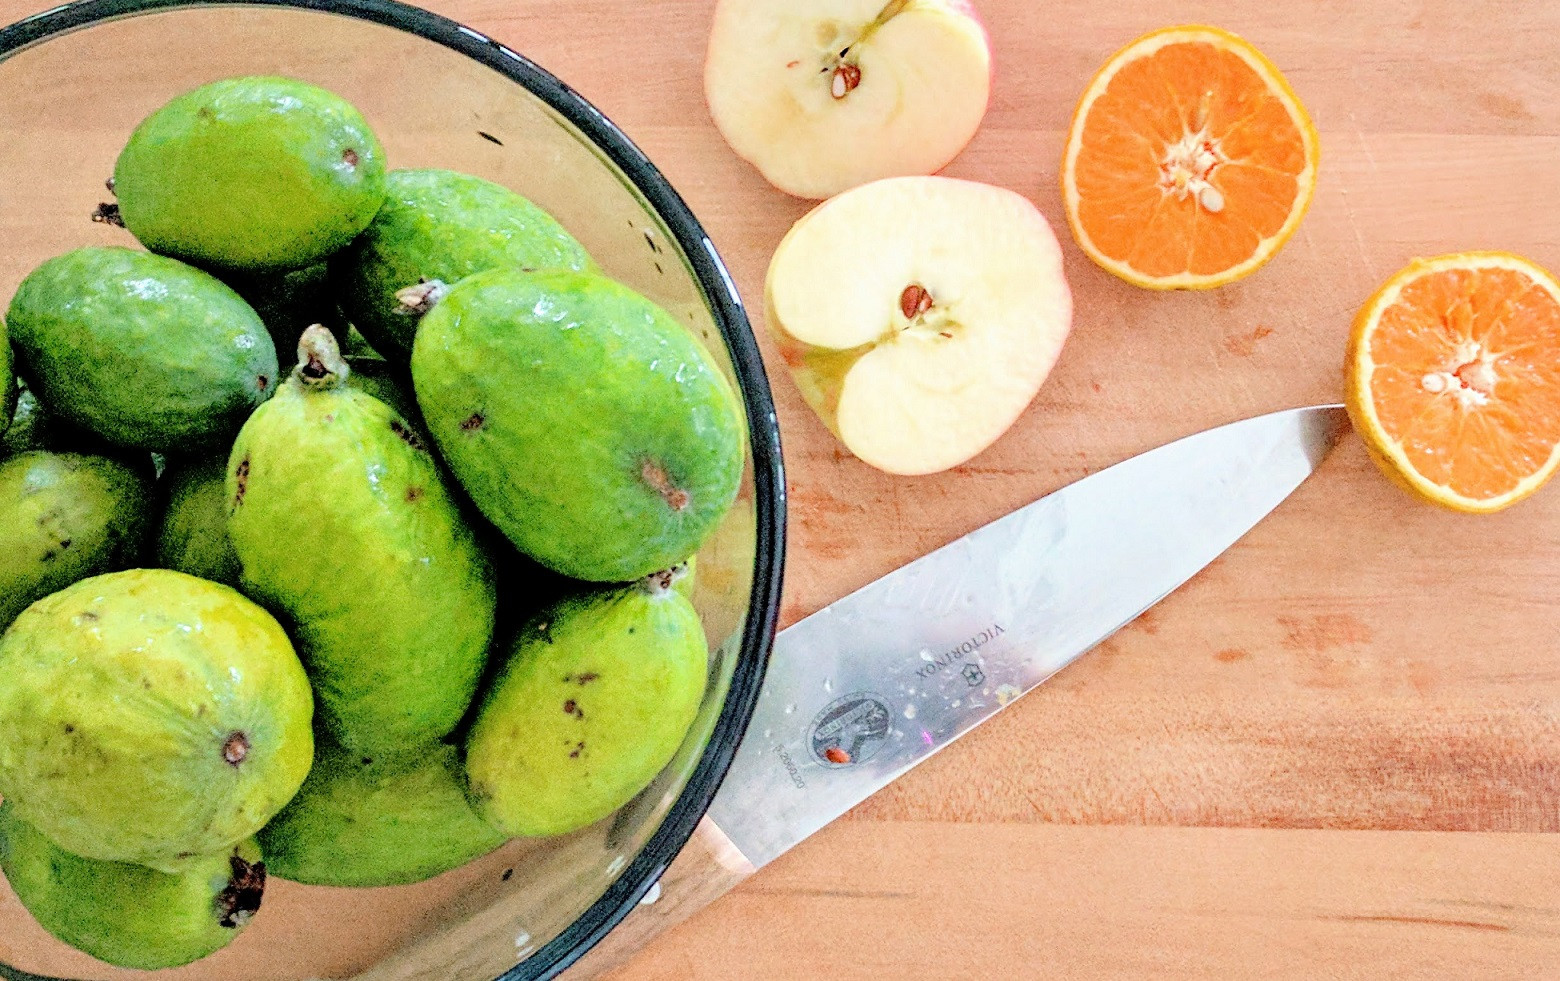 fruitingredients